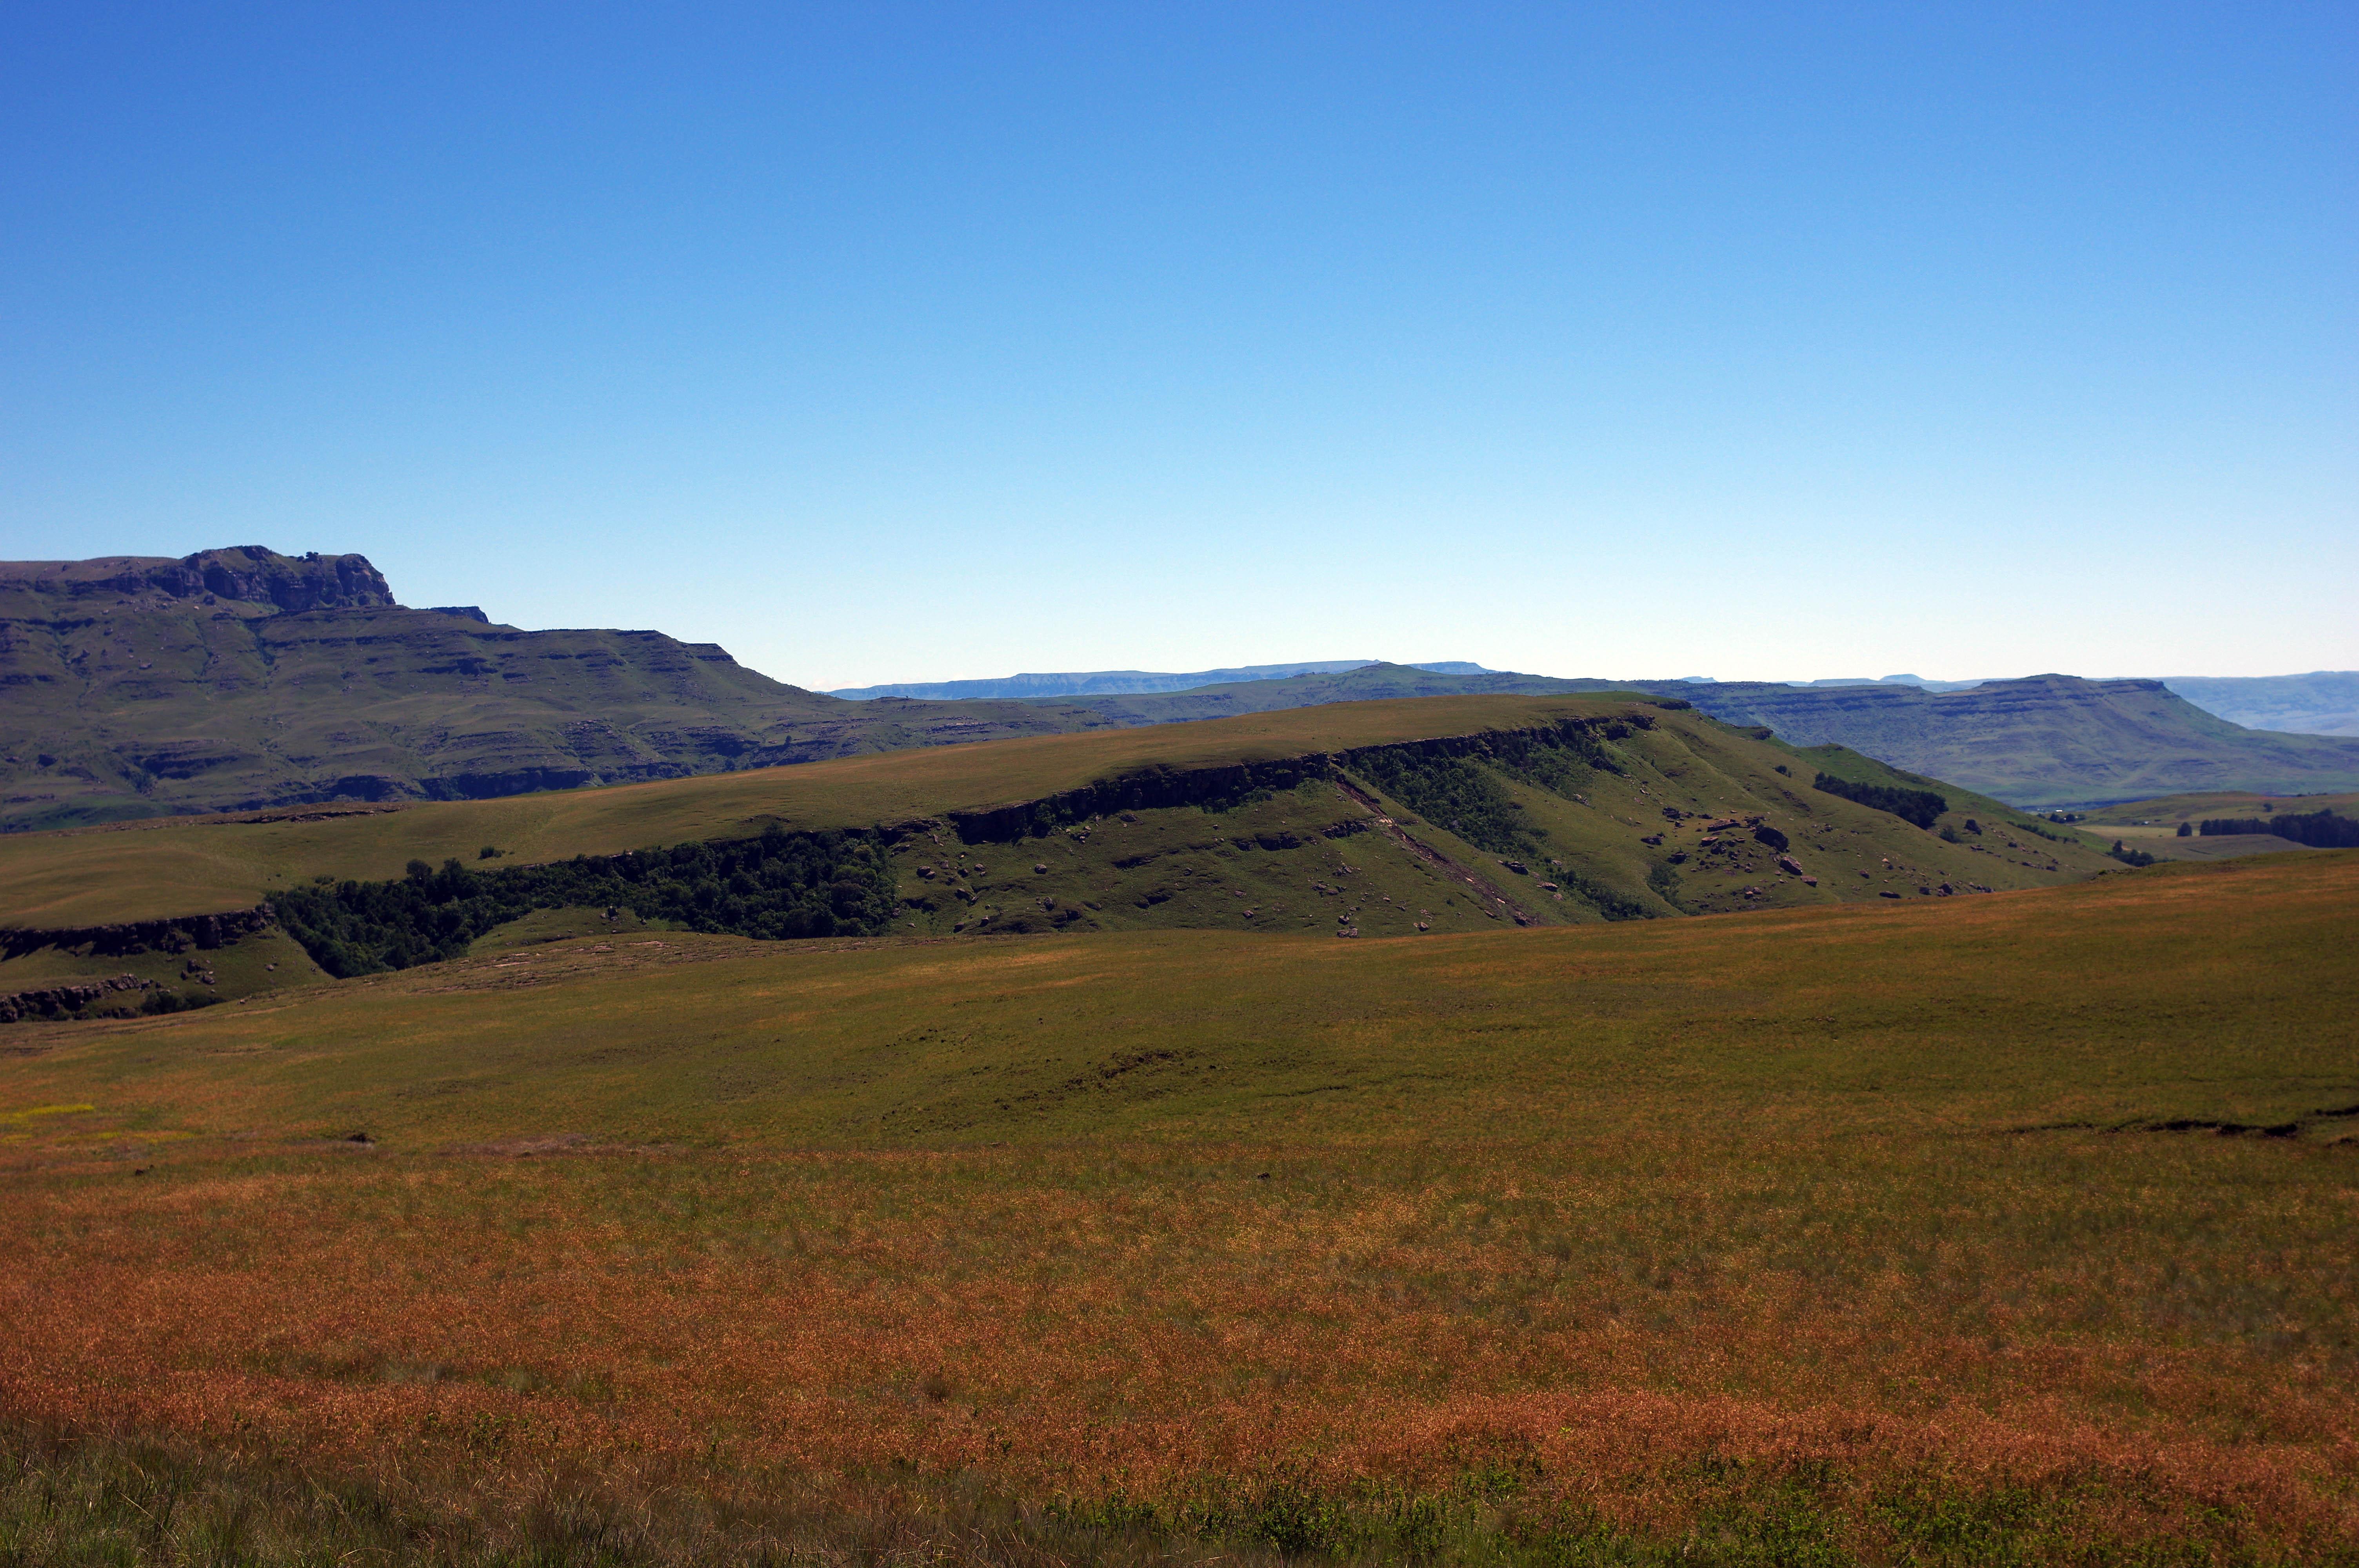 171128_Drakensberg-Cobham-Ndlovini57